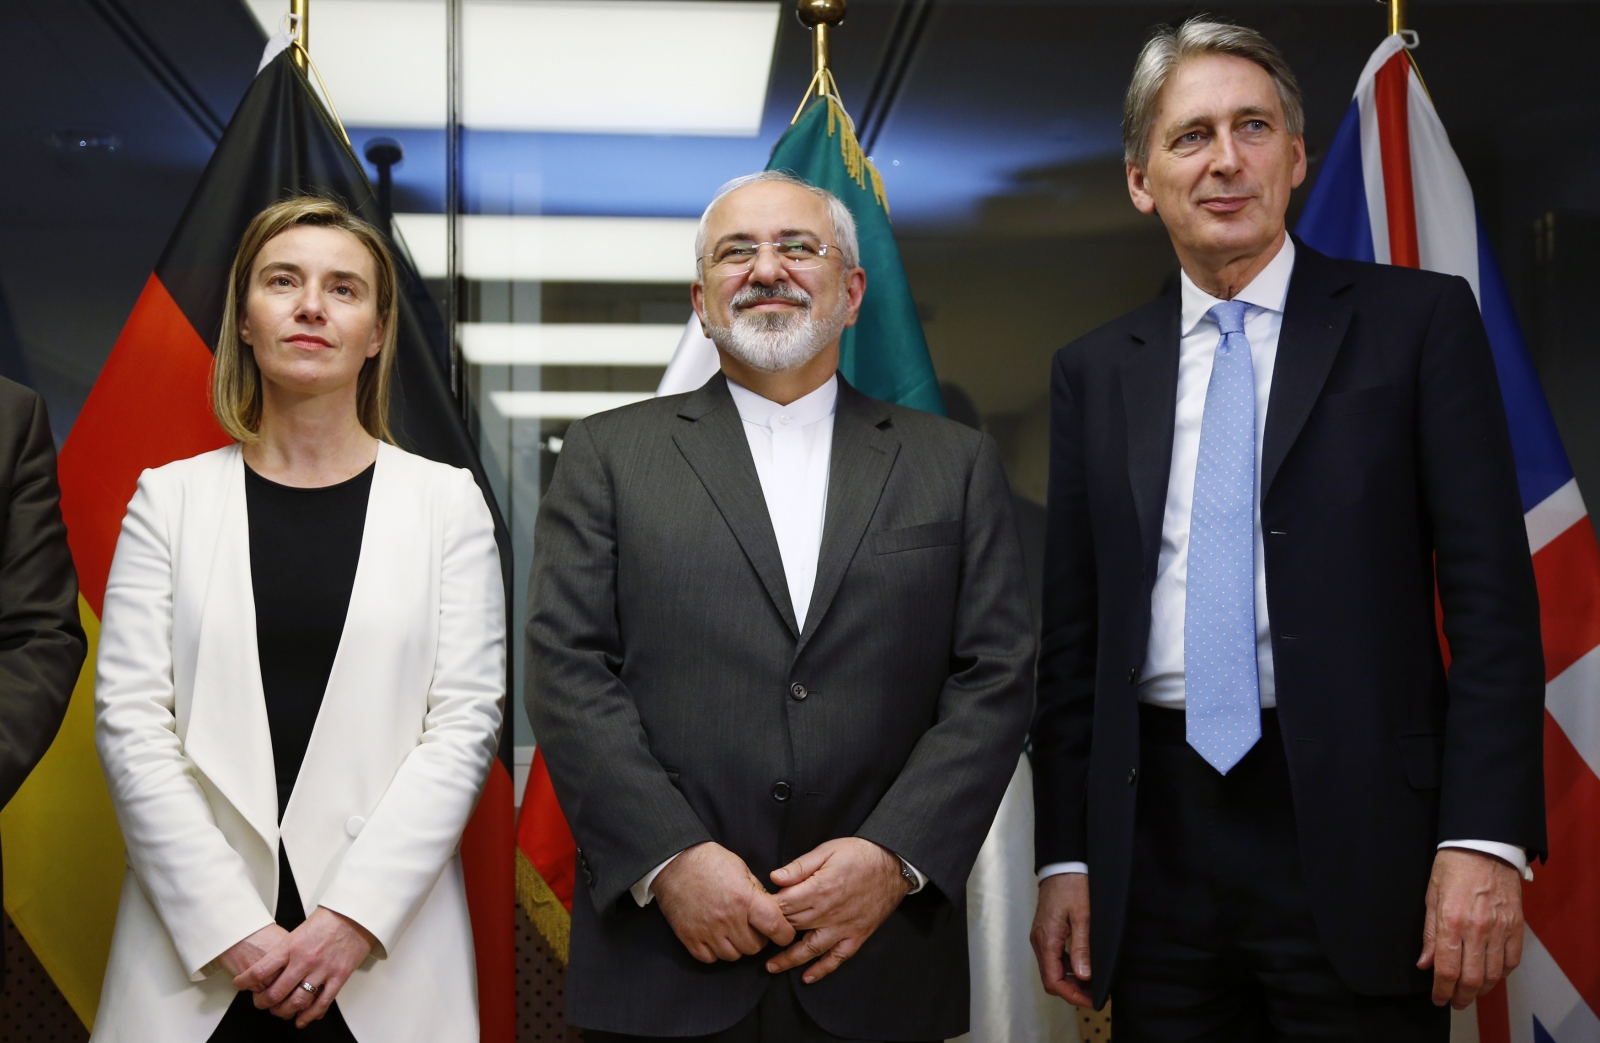 British embassy in Iran